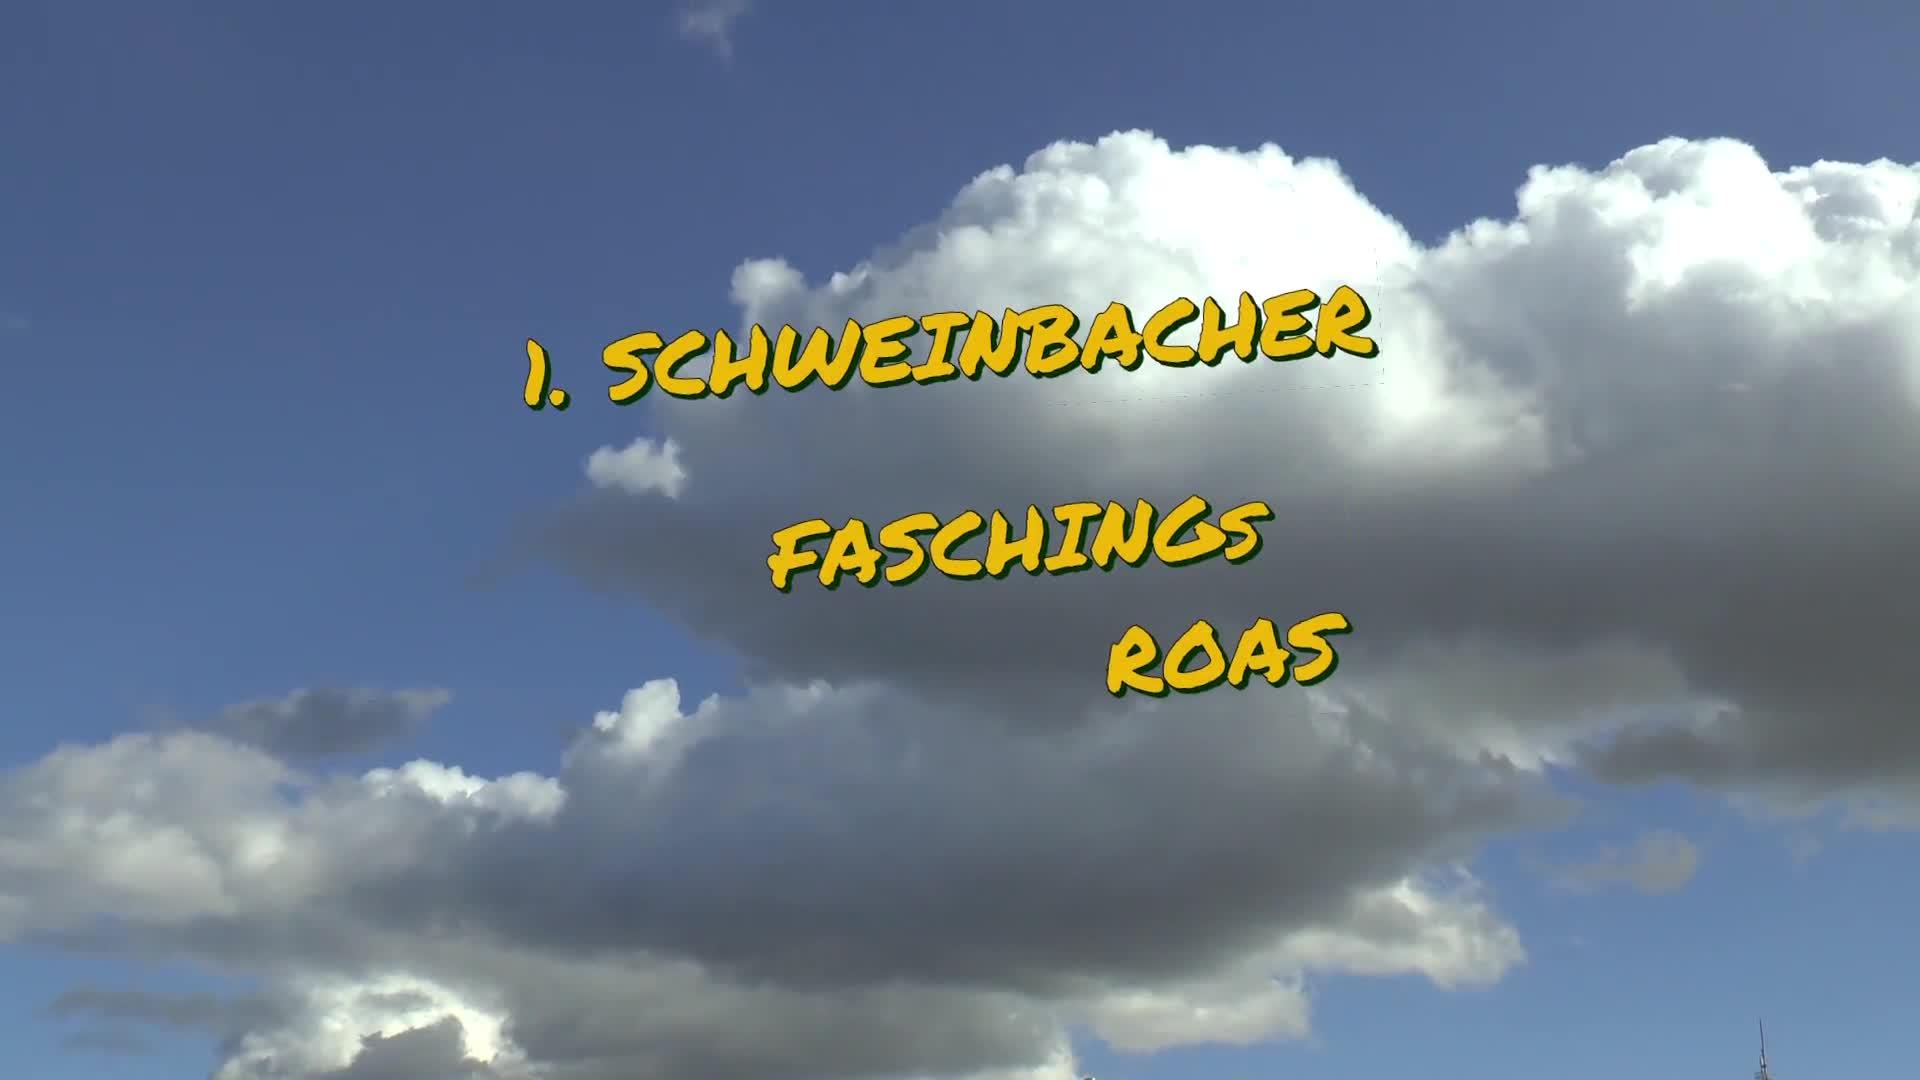 1. Schweinbacher Faschings-ROAS